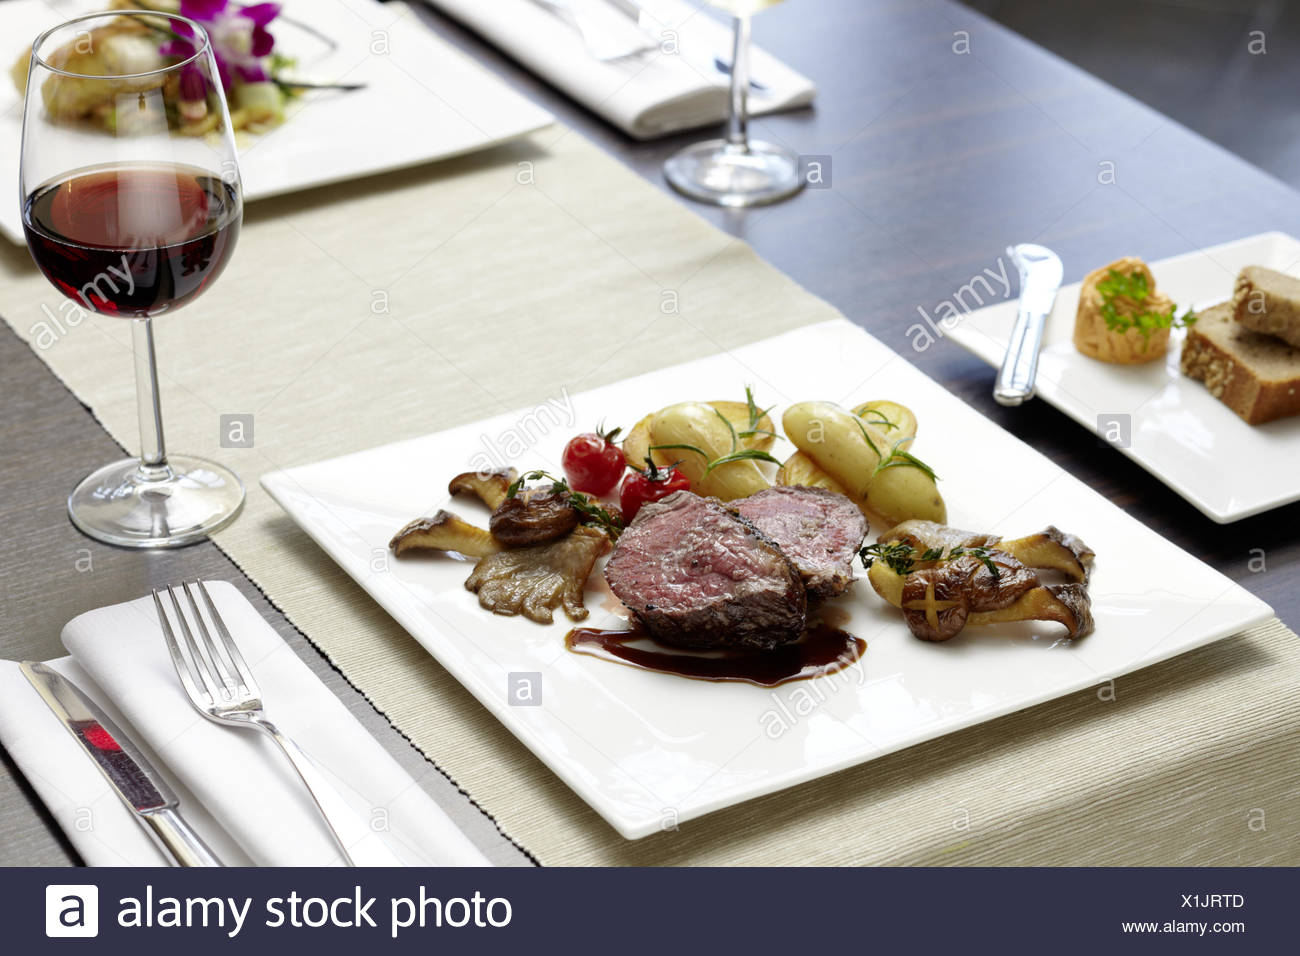 Steak with Salad - Stock Image